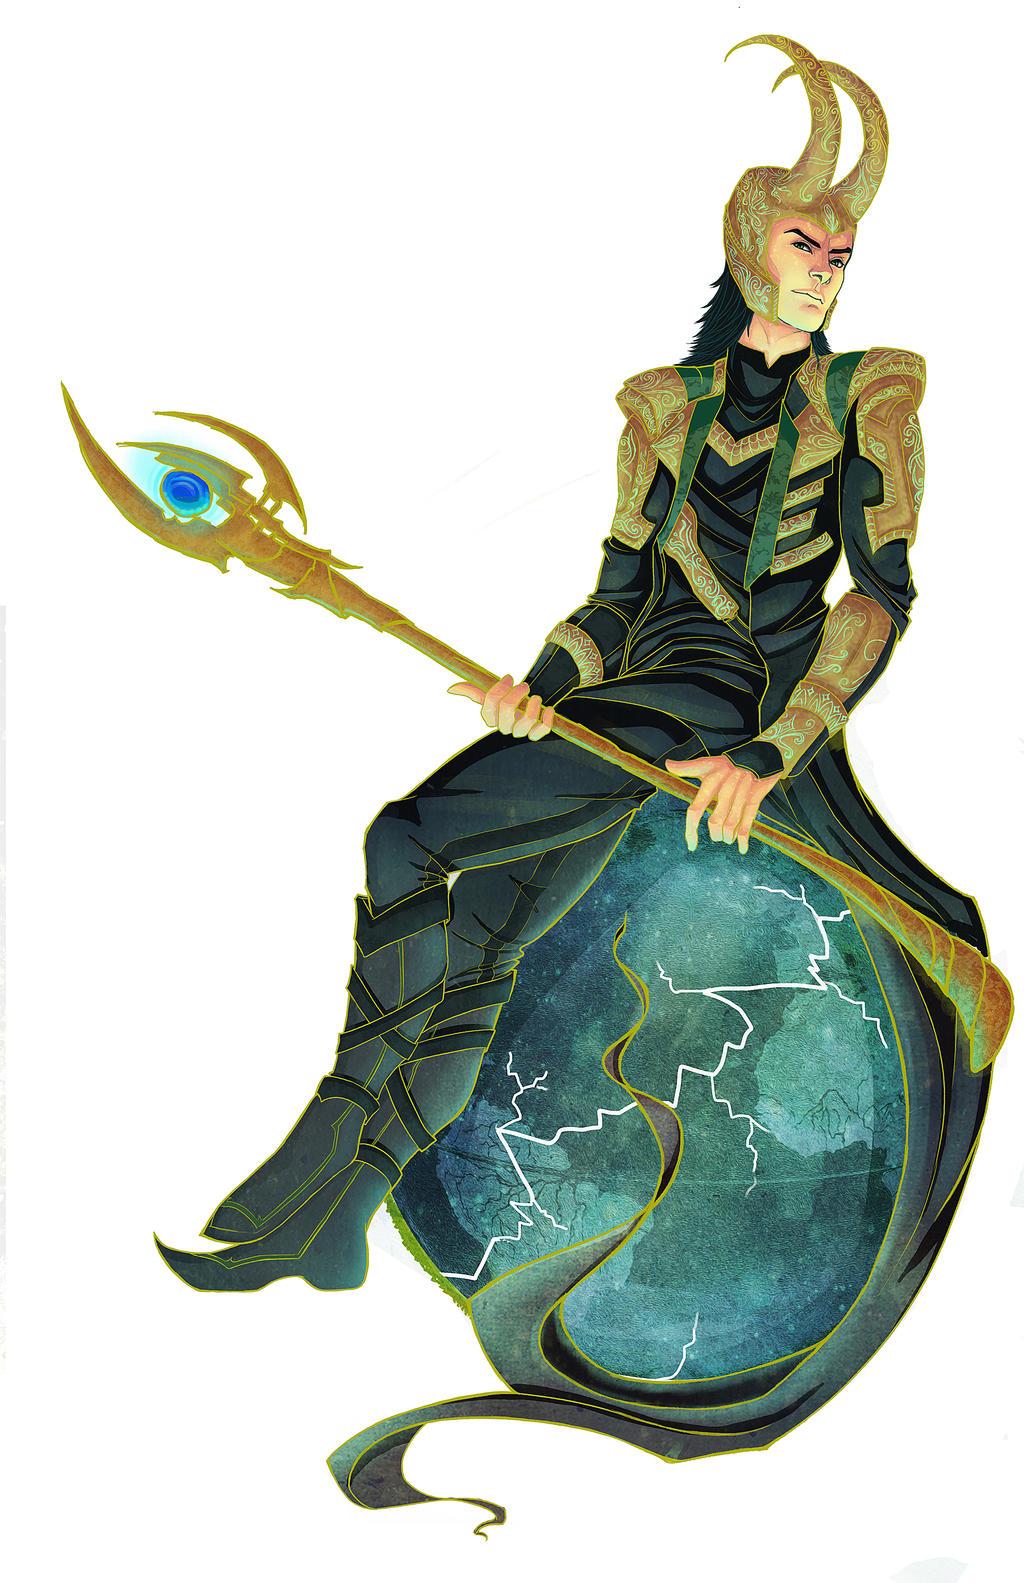 Loki by clarkegilmore